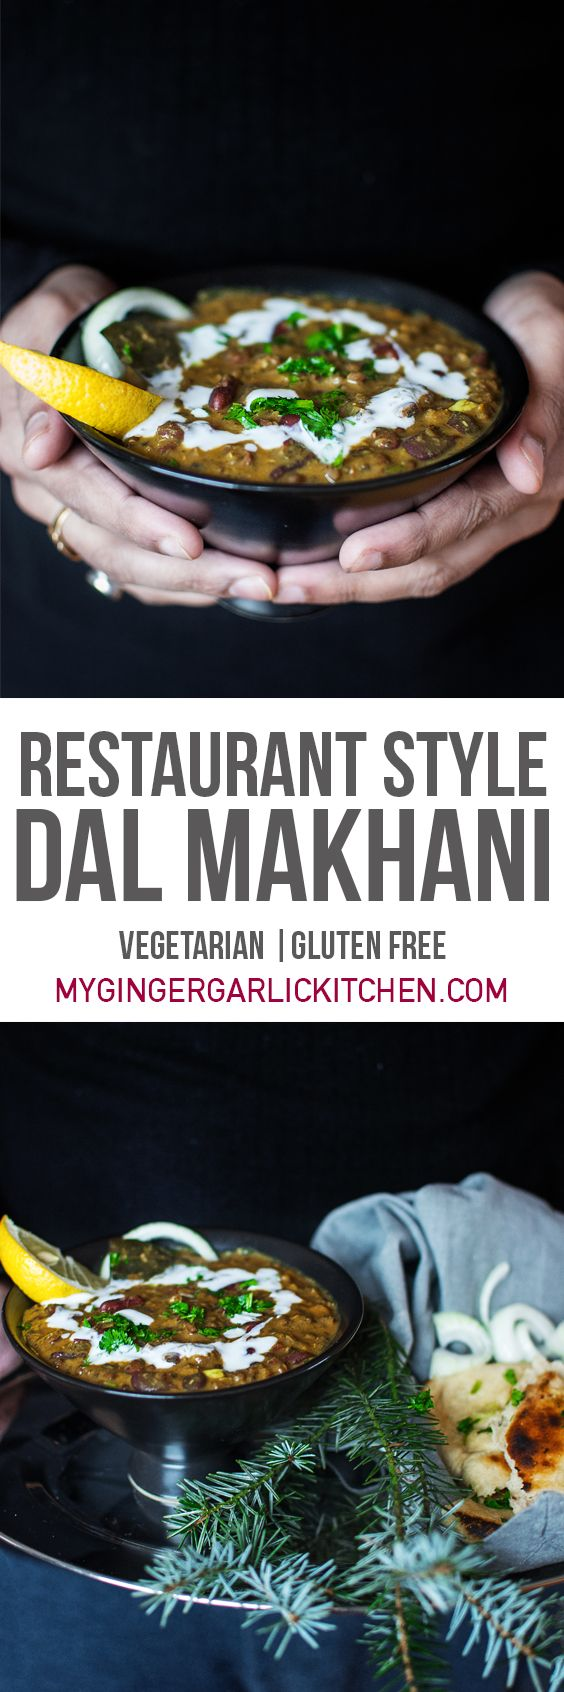 Restaurant style dal makhani punjabi dal makhani video recipe restaurant style dal makhani punjabi dal makhani video recipe punjabi cuisine simple words and glutenfree forumfinder Gallery